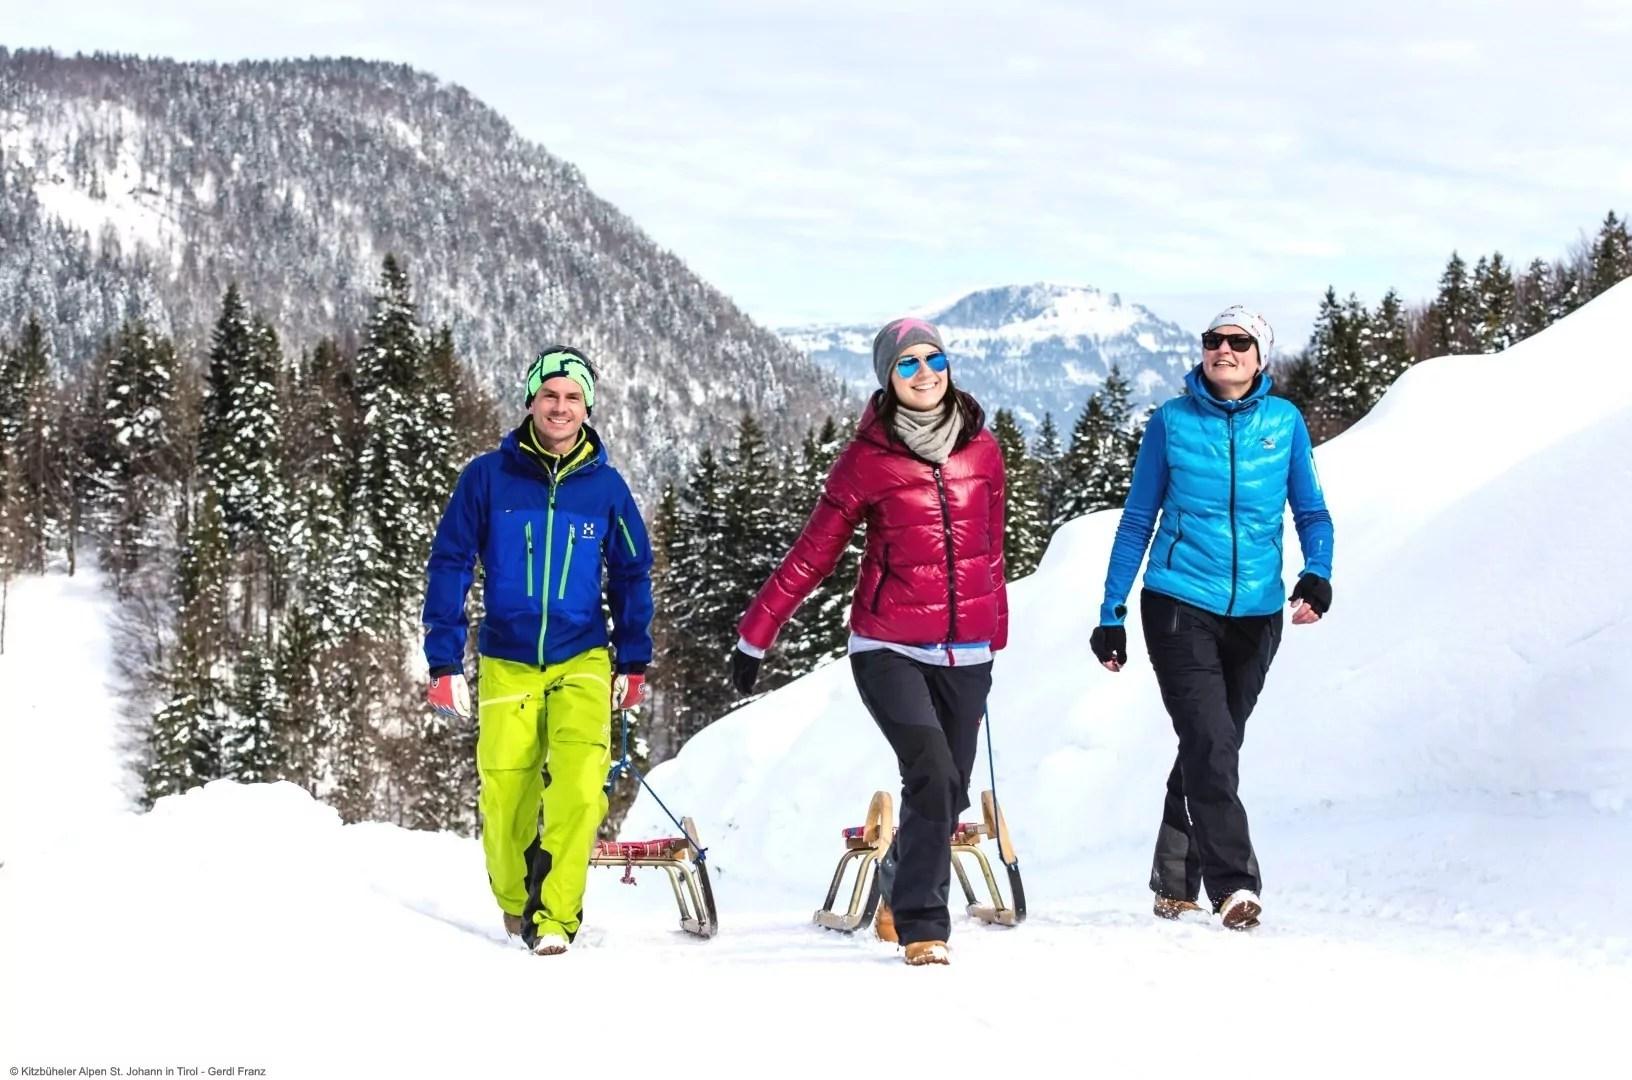 après-ski in St. Johann in Tirol